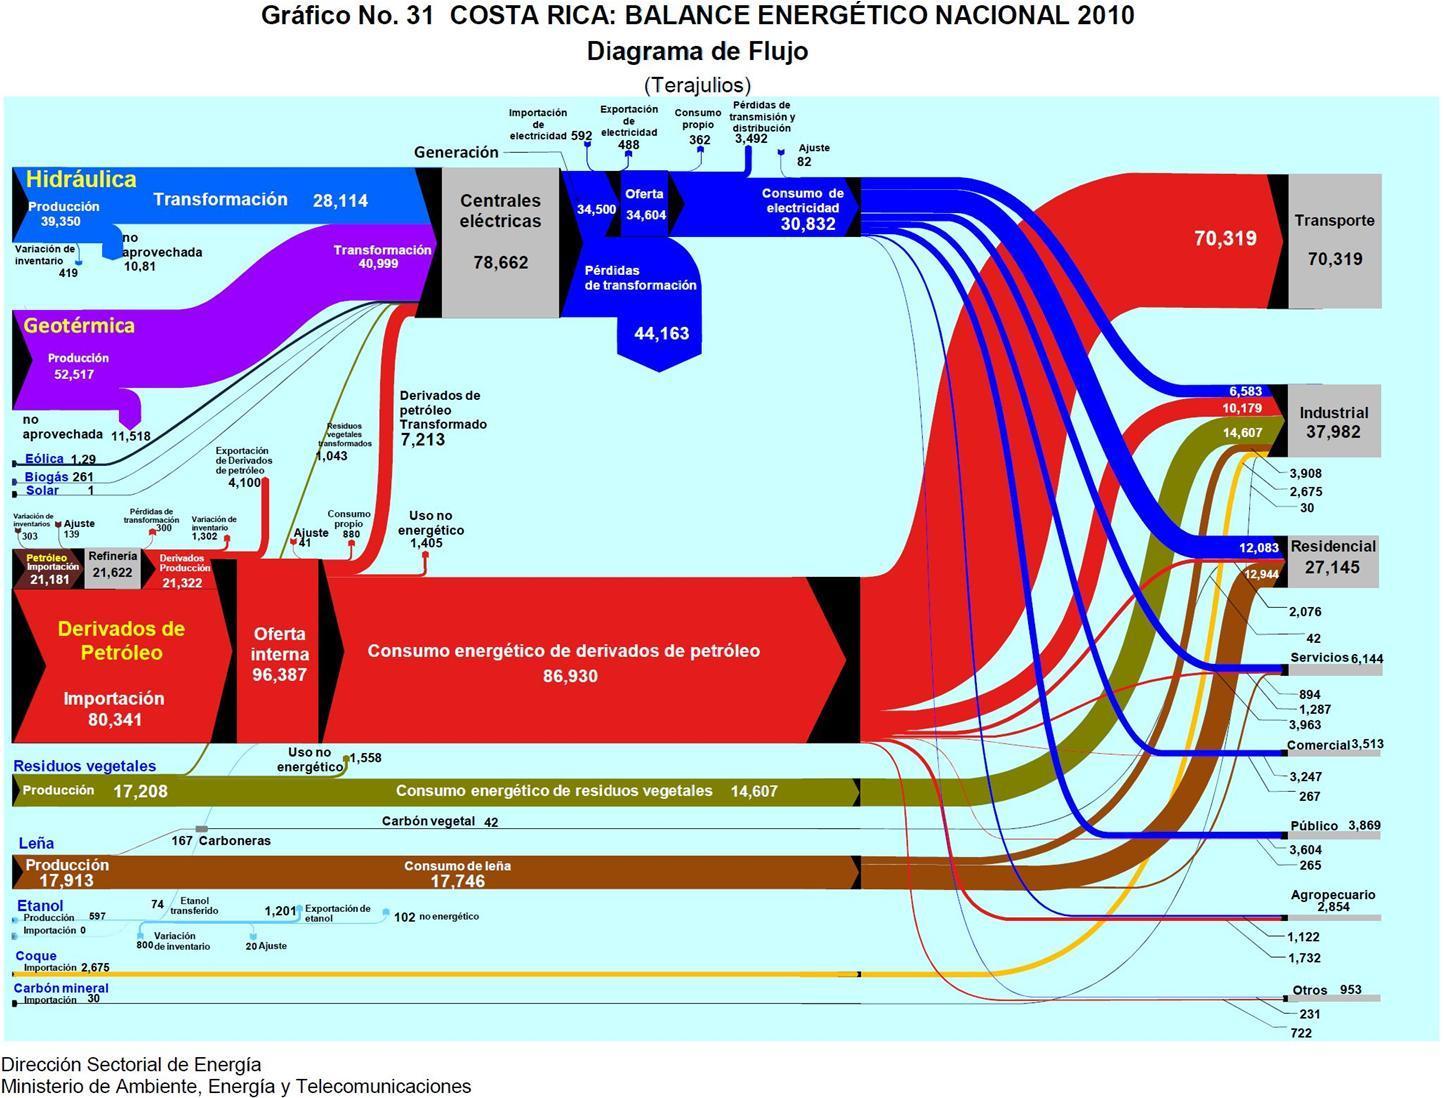 balance_energetico_costarica2010-jpg